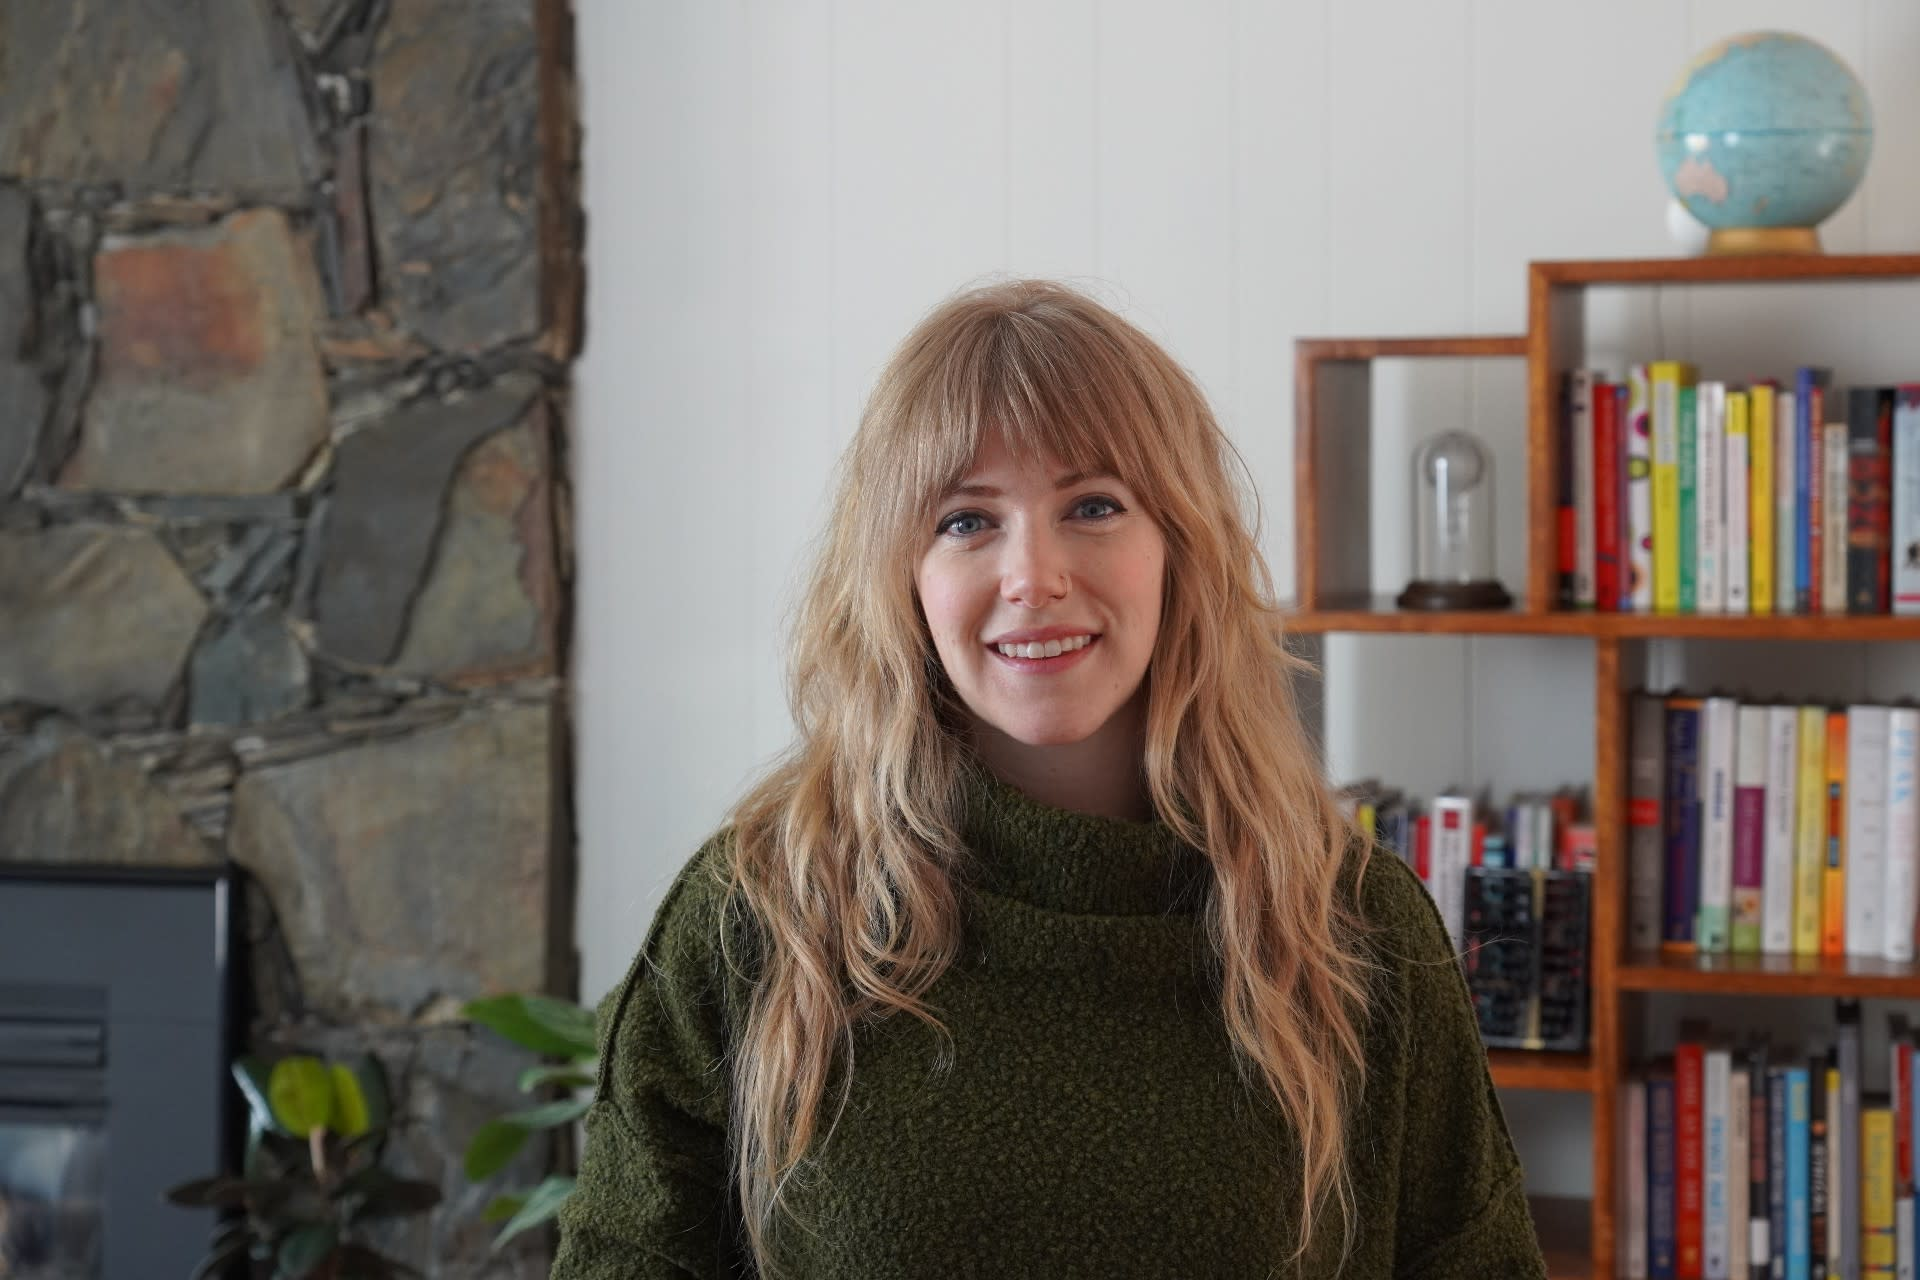 Portrait of Ceara Crawshaw, CEO of Pencil & Paper